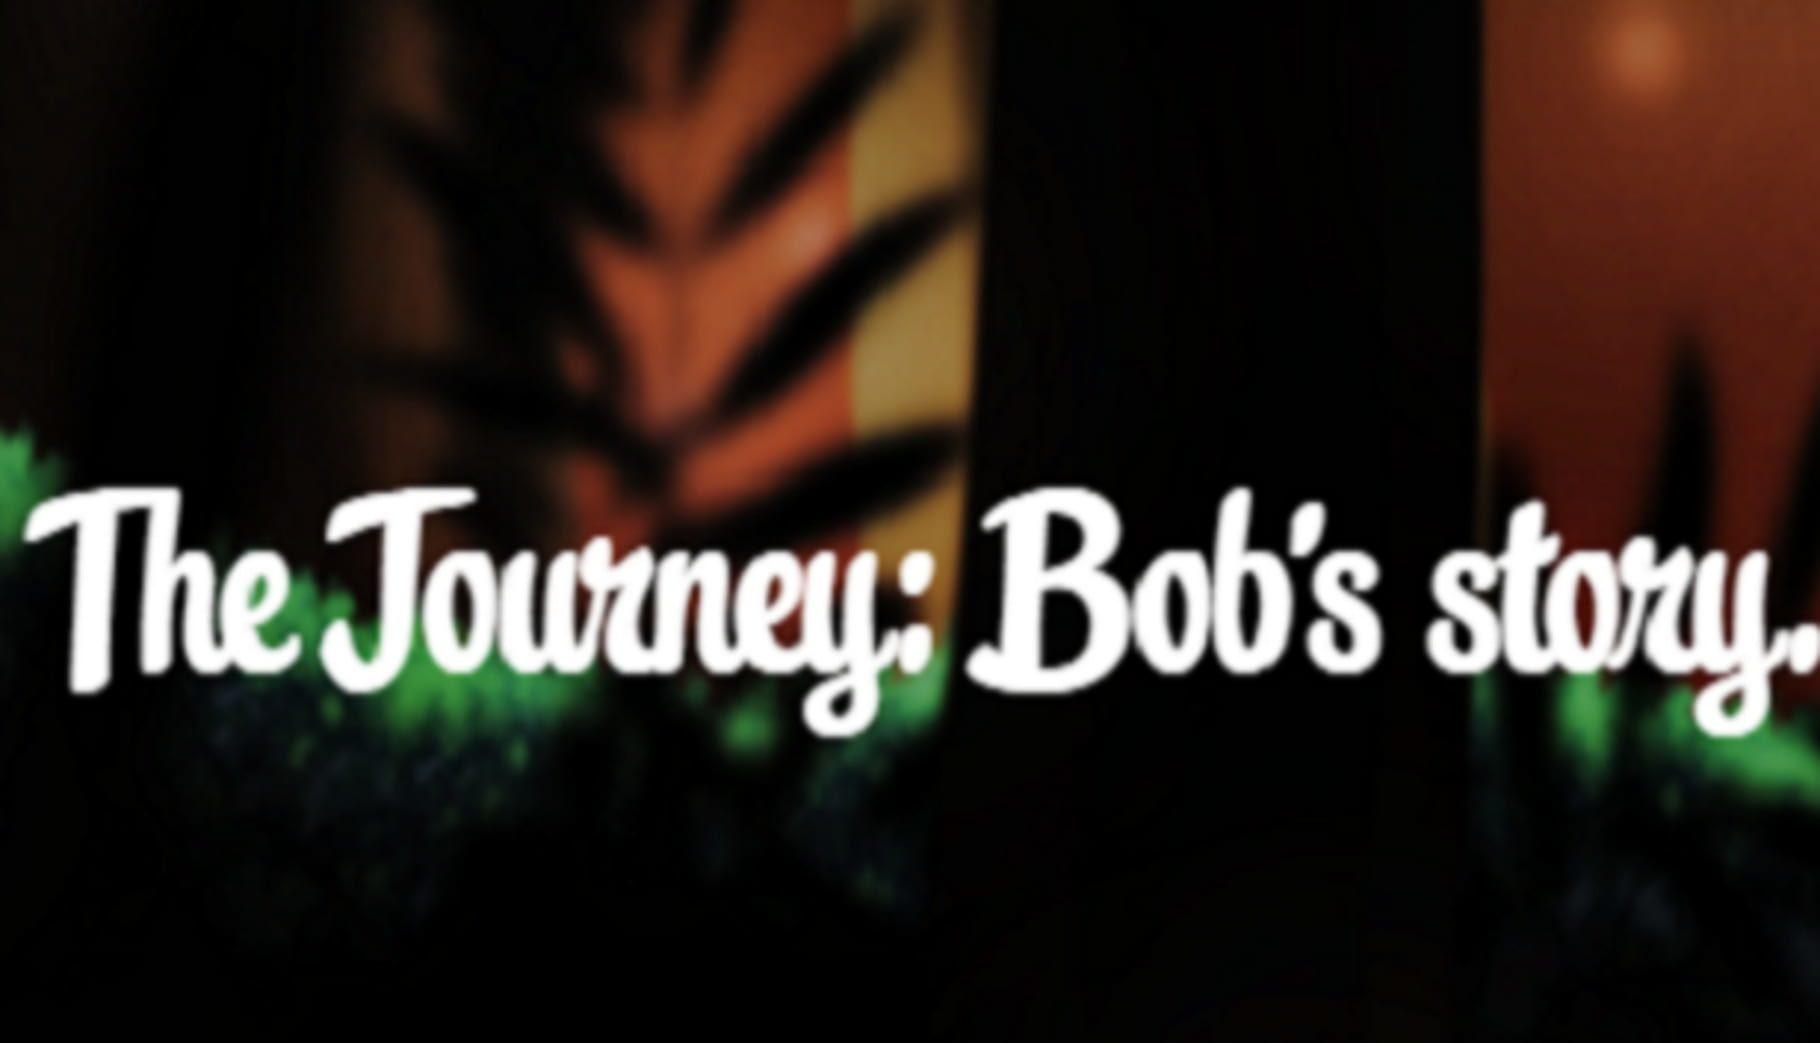 buy The Journey: Bob's Story cd key for all platform